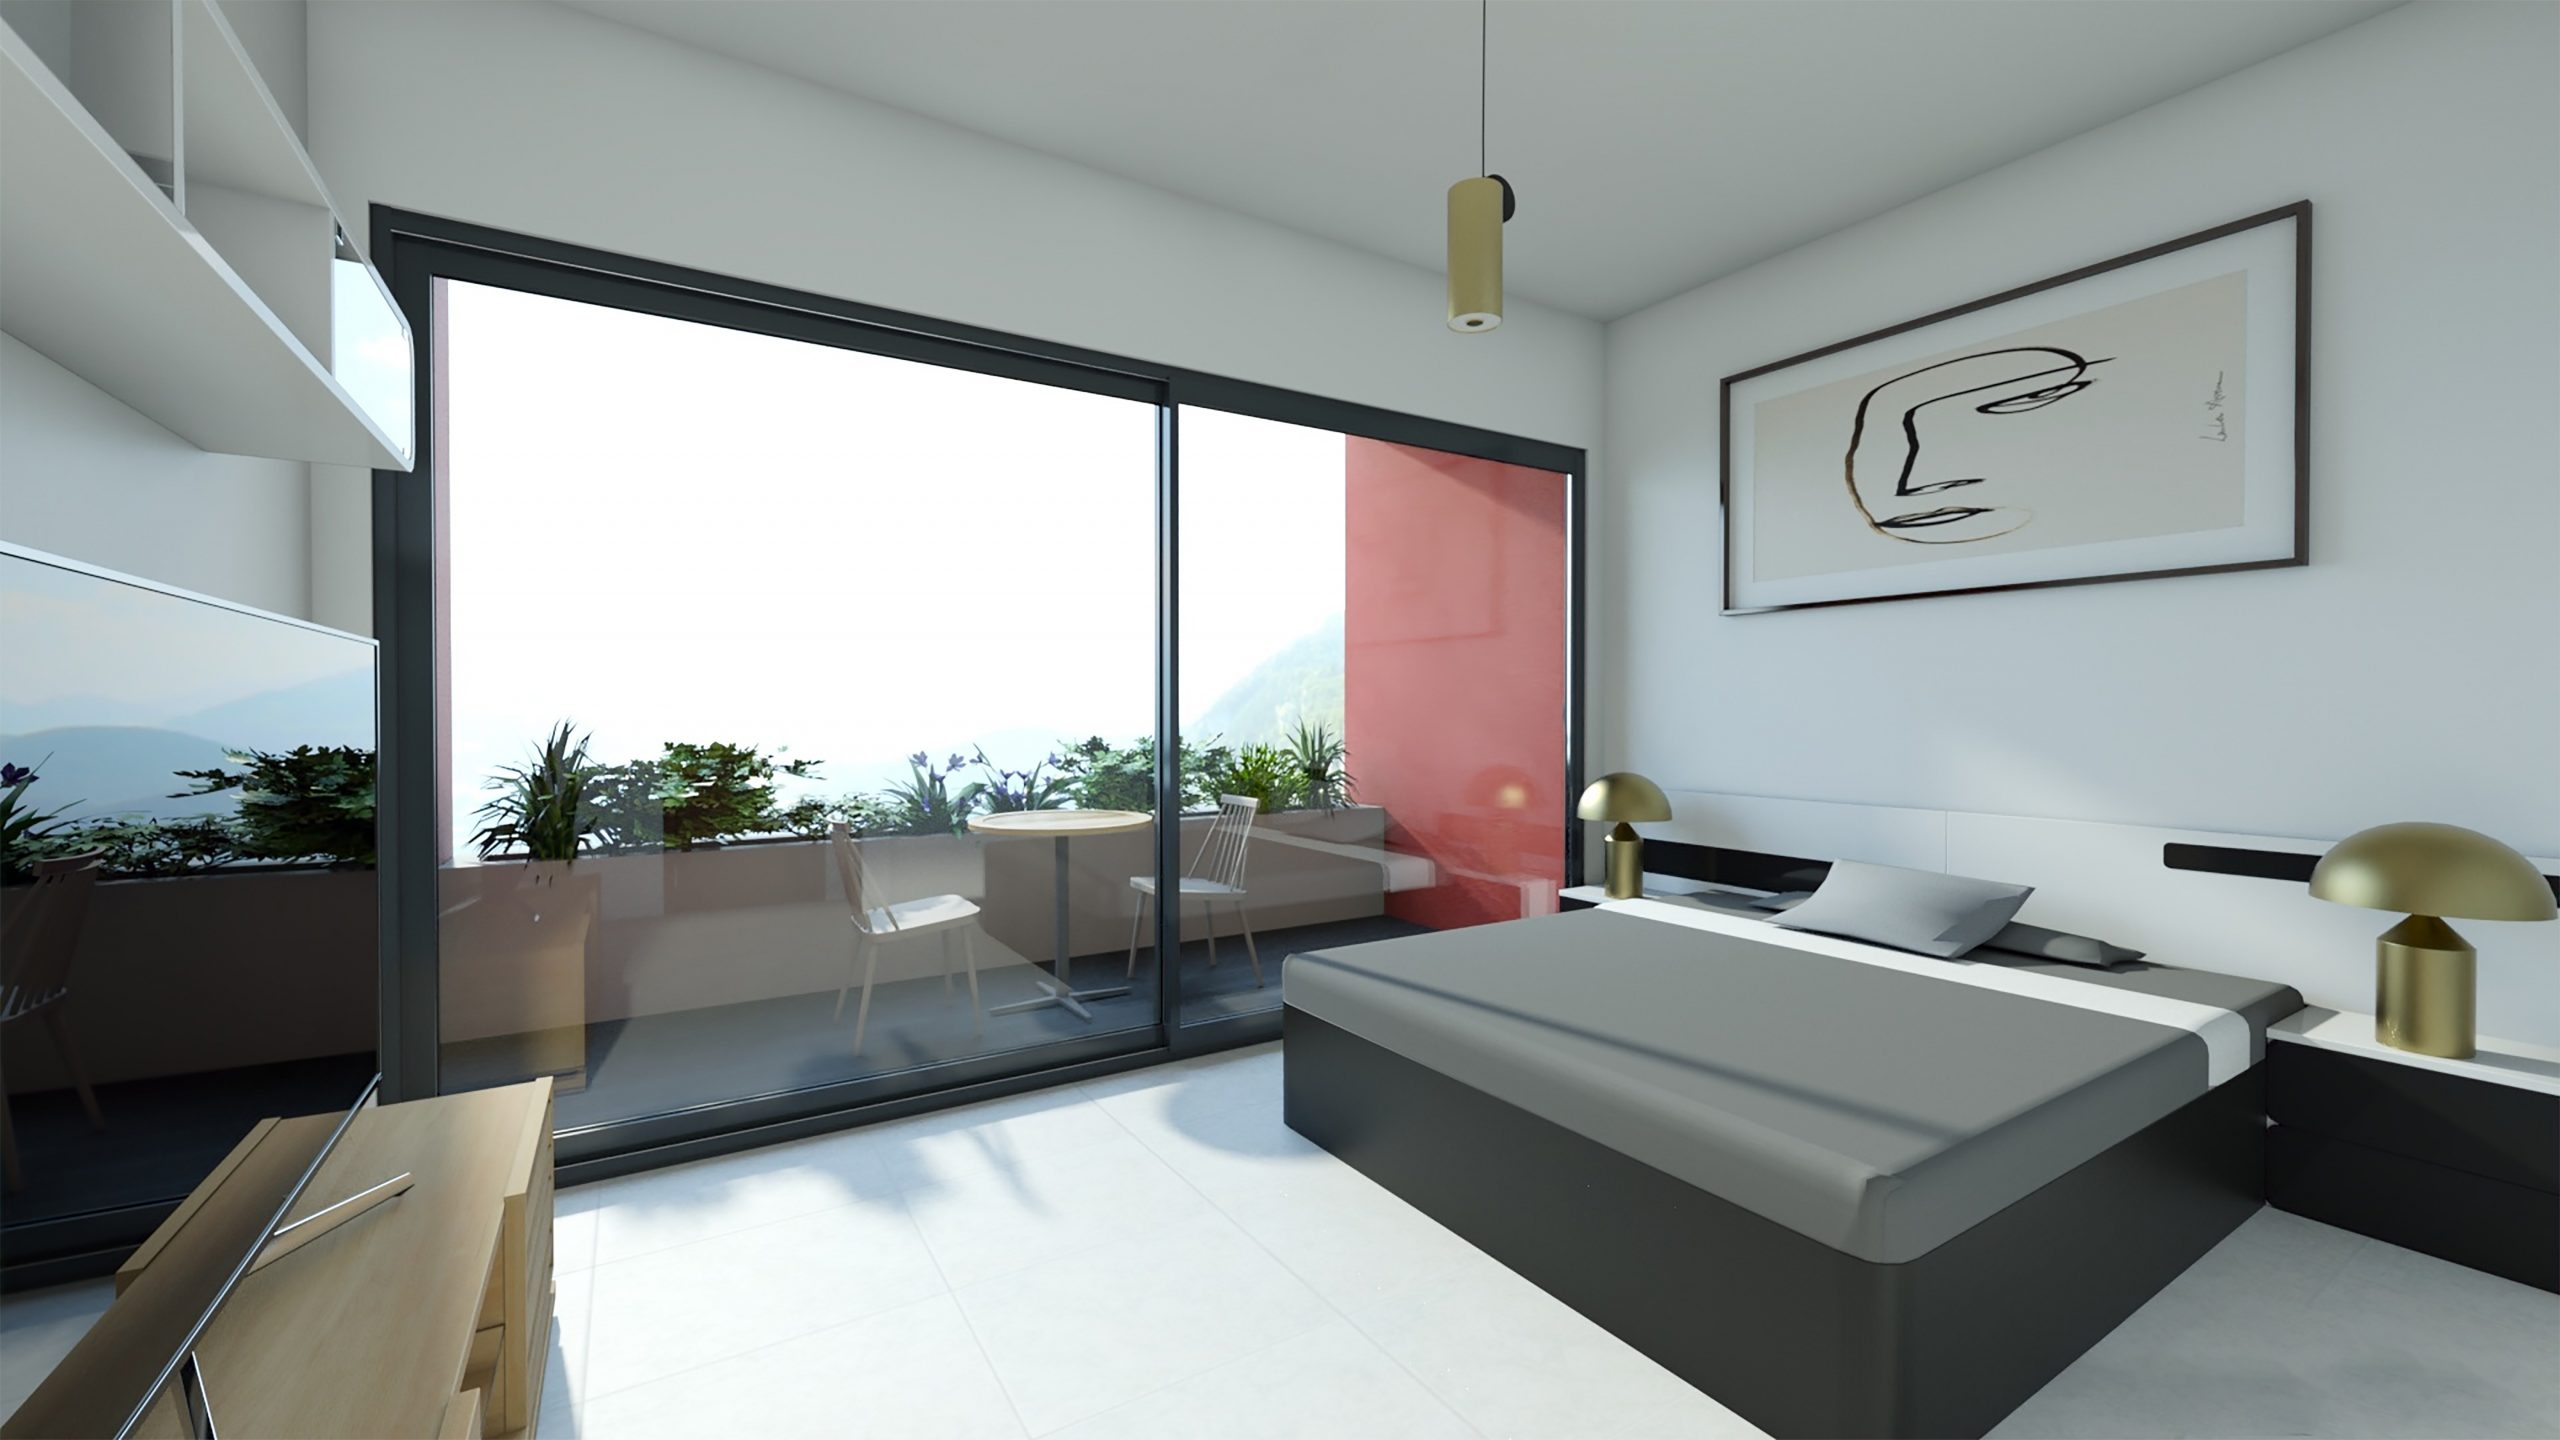 Roquebrune-Cap-Martin Spacious 2 bedrooms with sea view